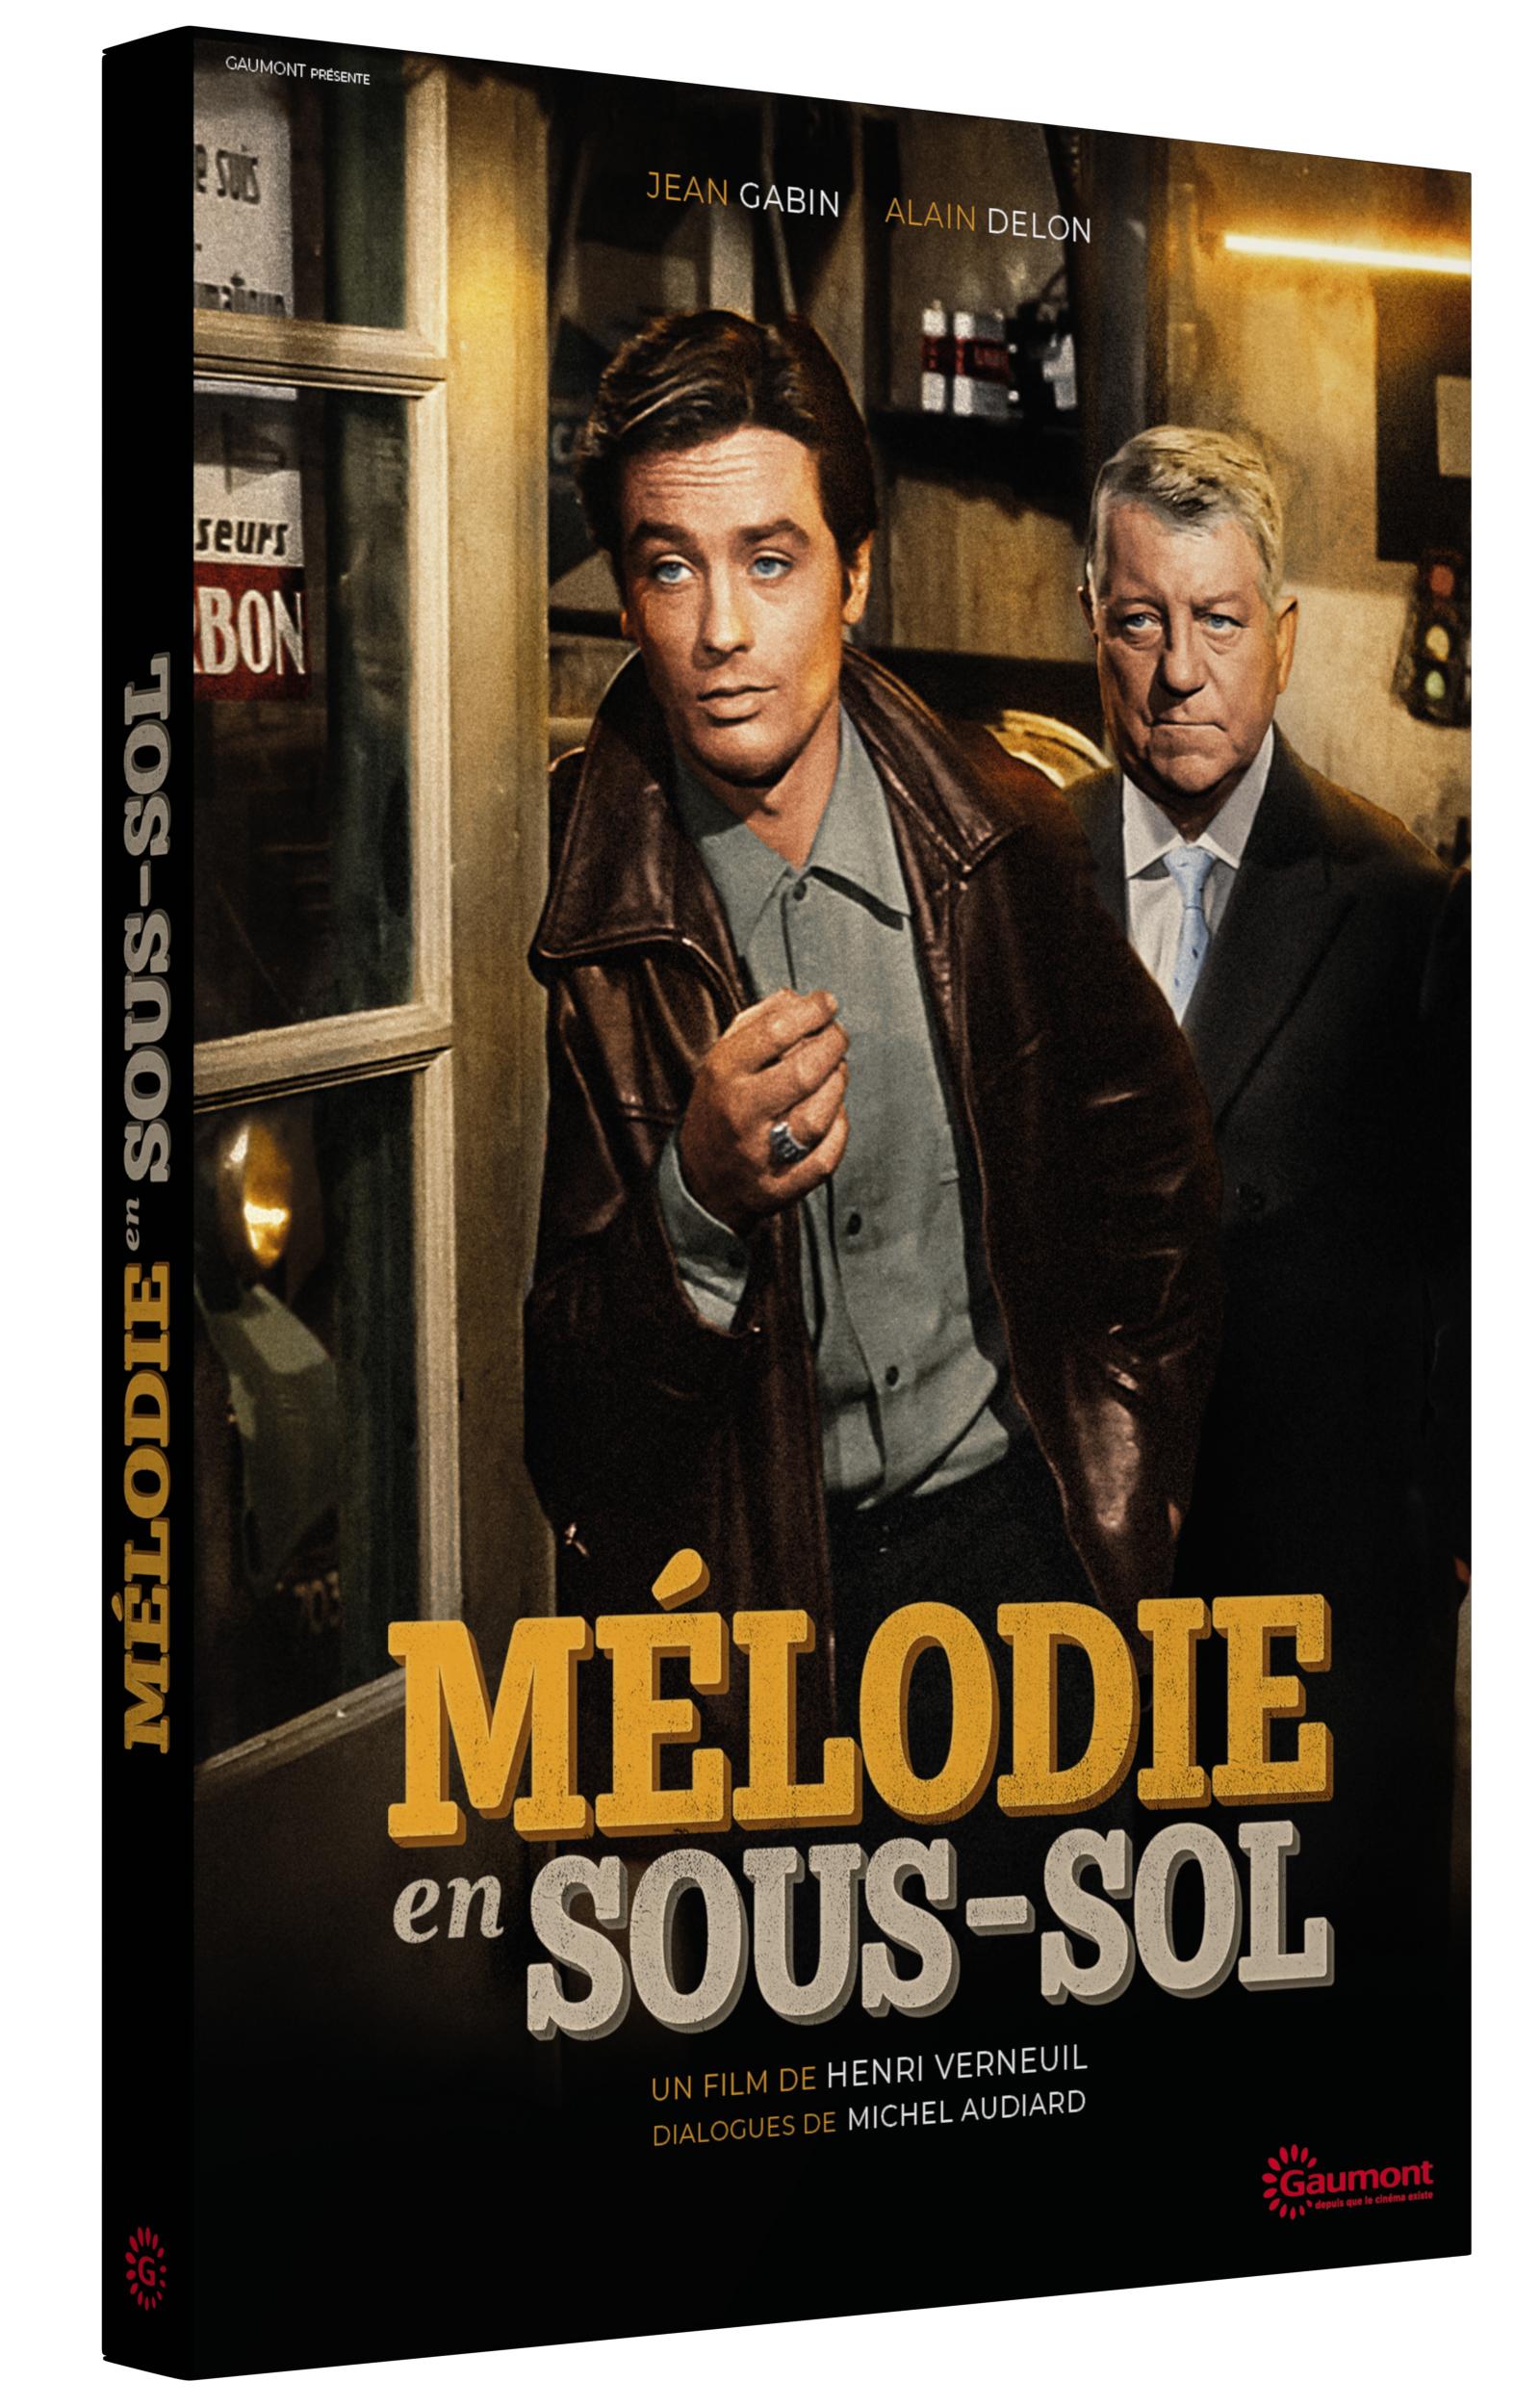 MELODIE EN SOUS-SOL